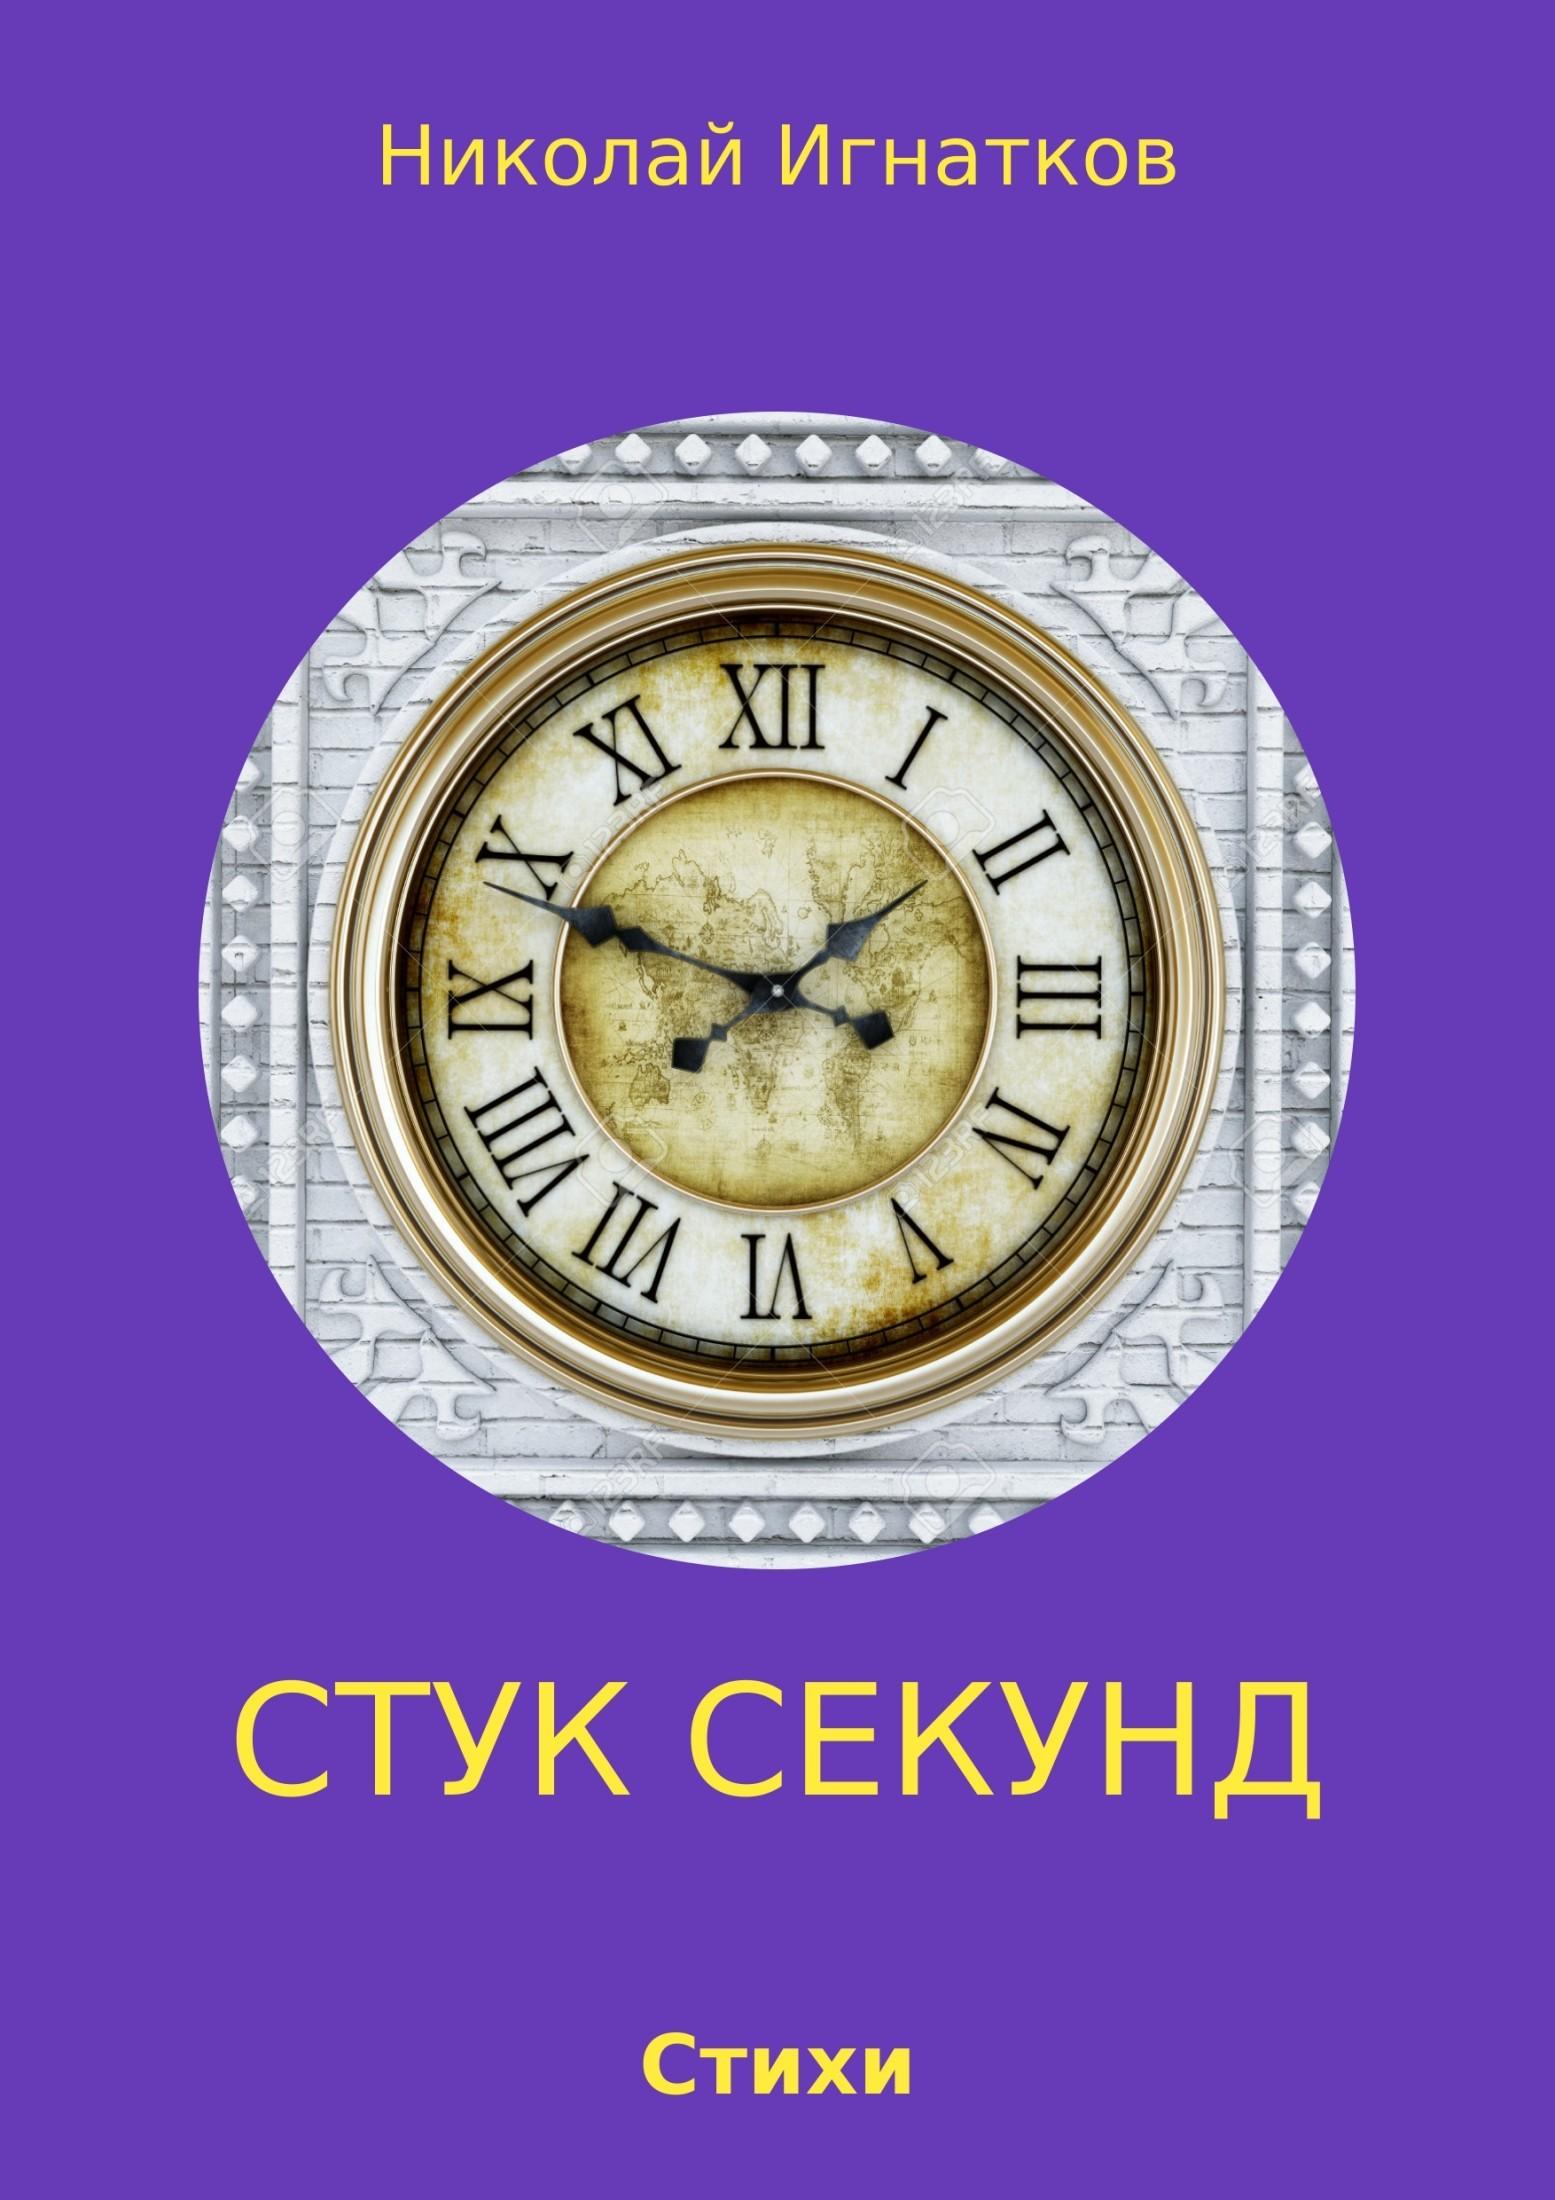 Откроем книгу вместе 32/24/45/32244517.bin.dir/32244517.cover.jpg обложка